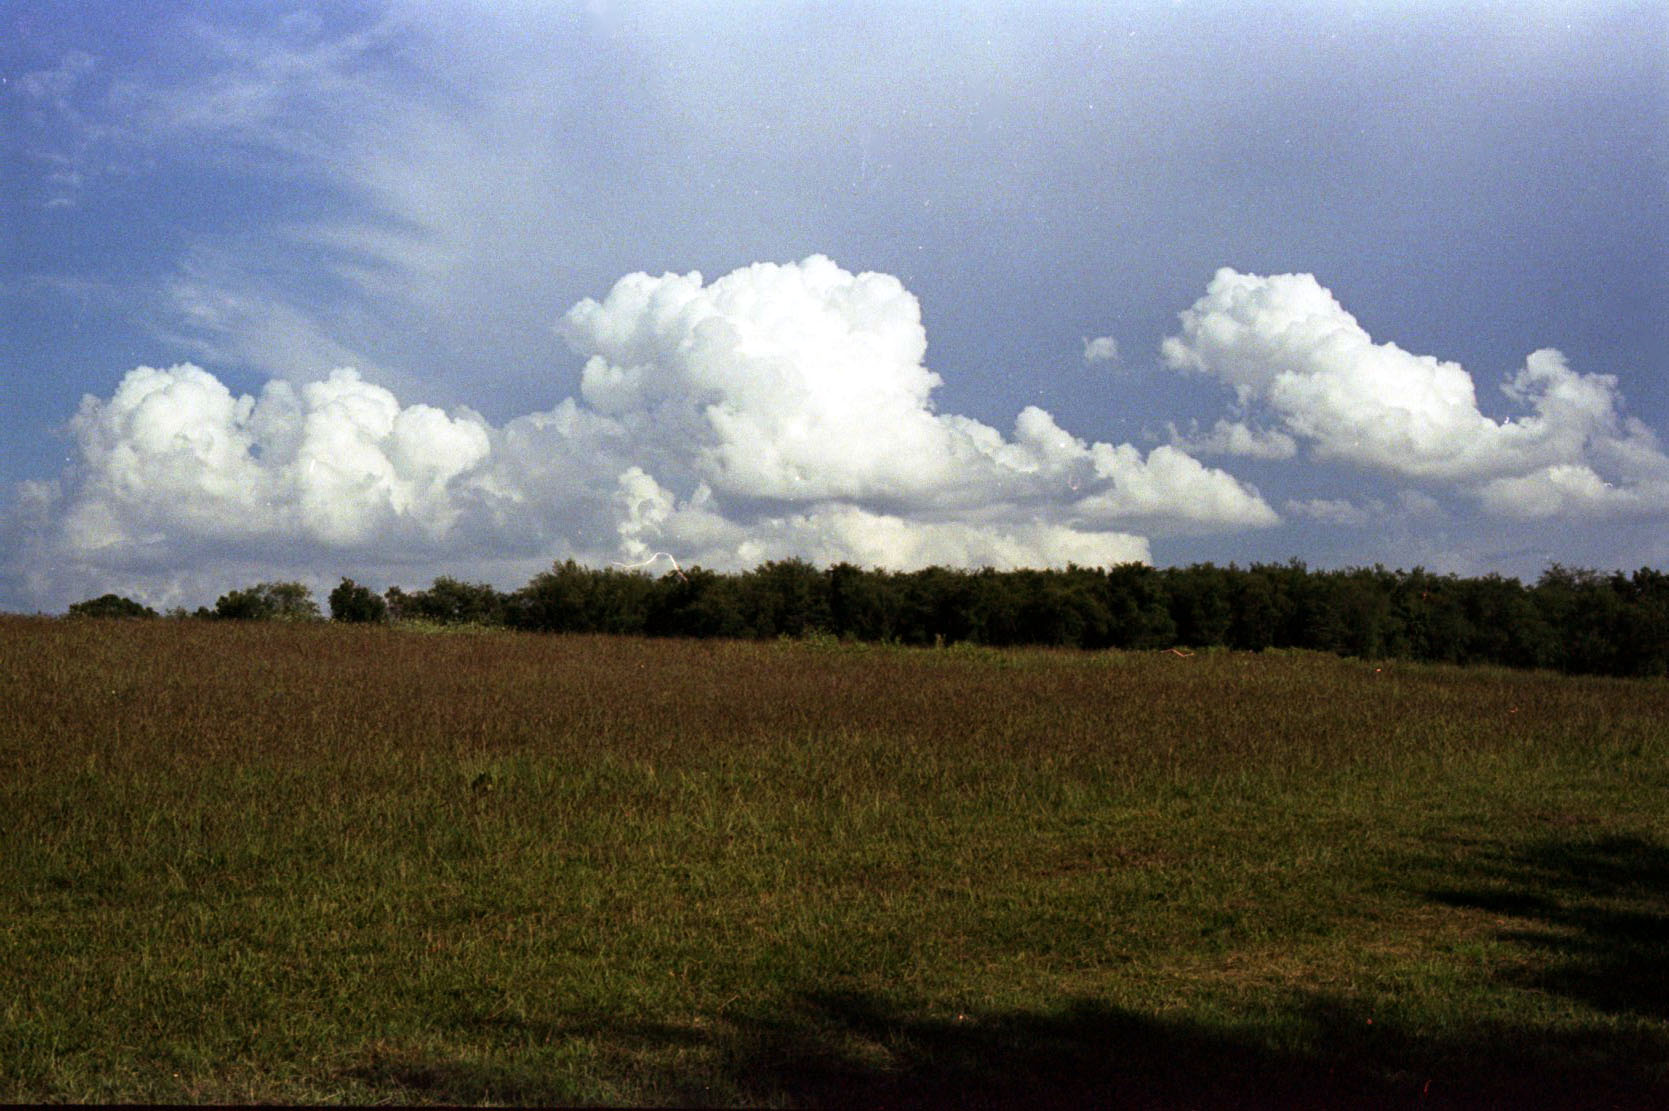 clouds_landscape_28486265863_o.jpg